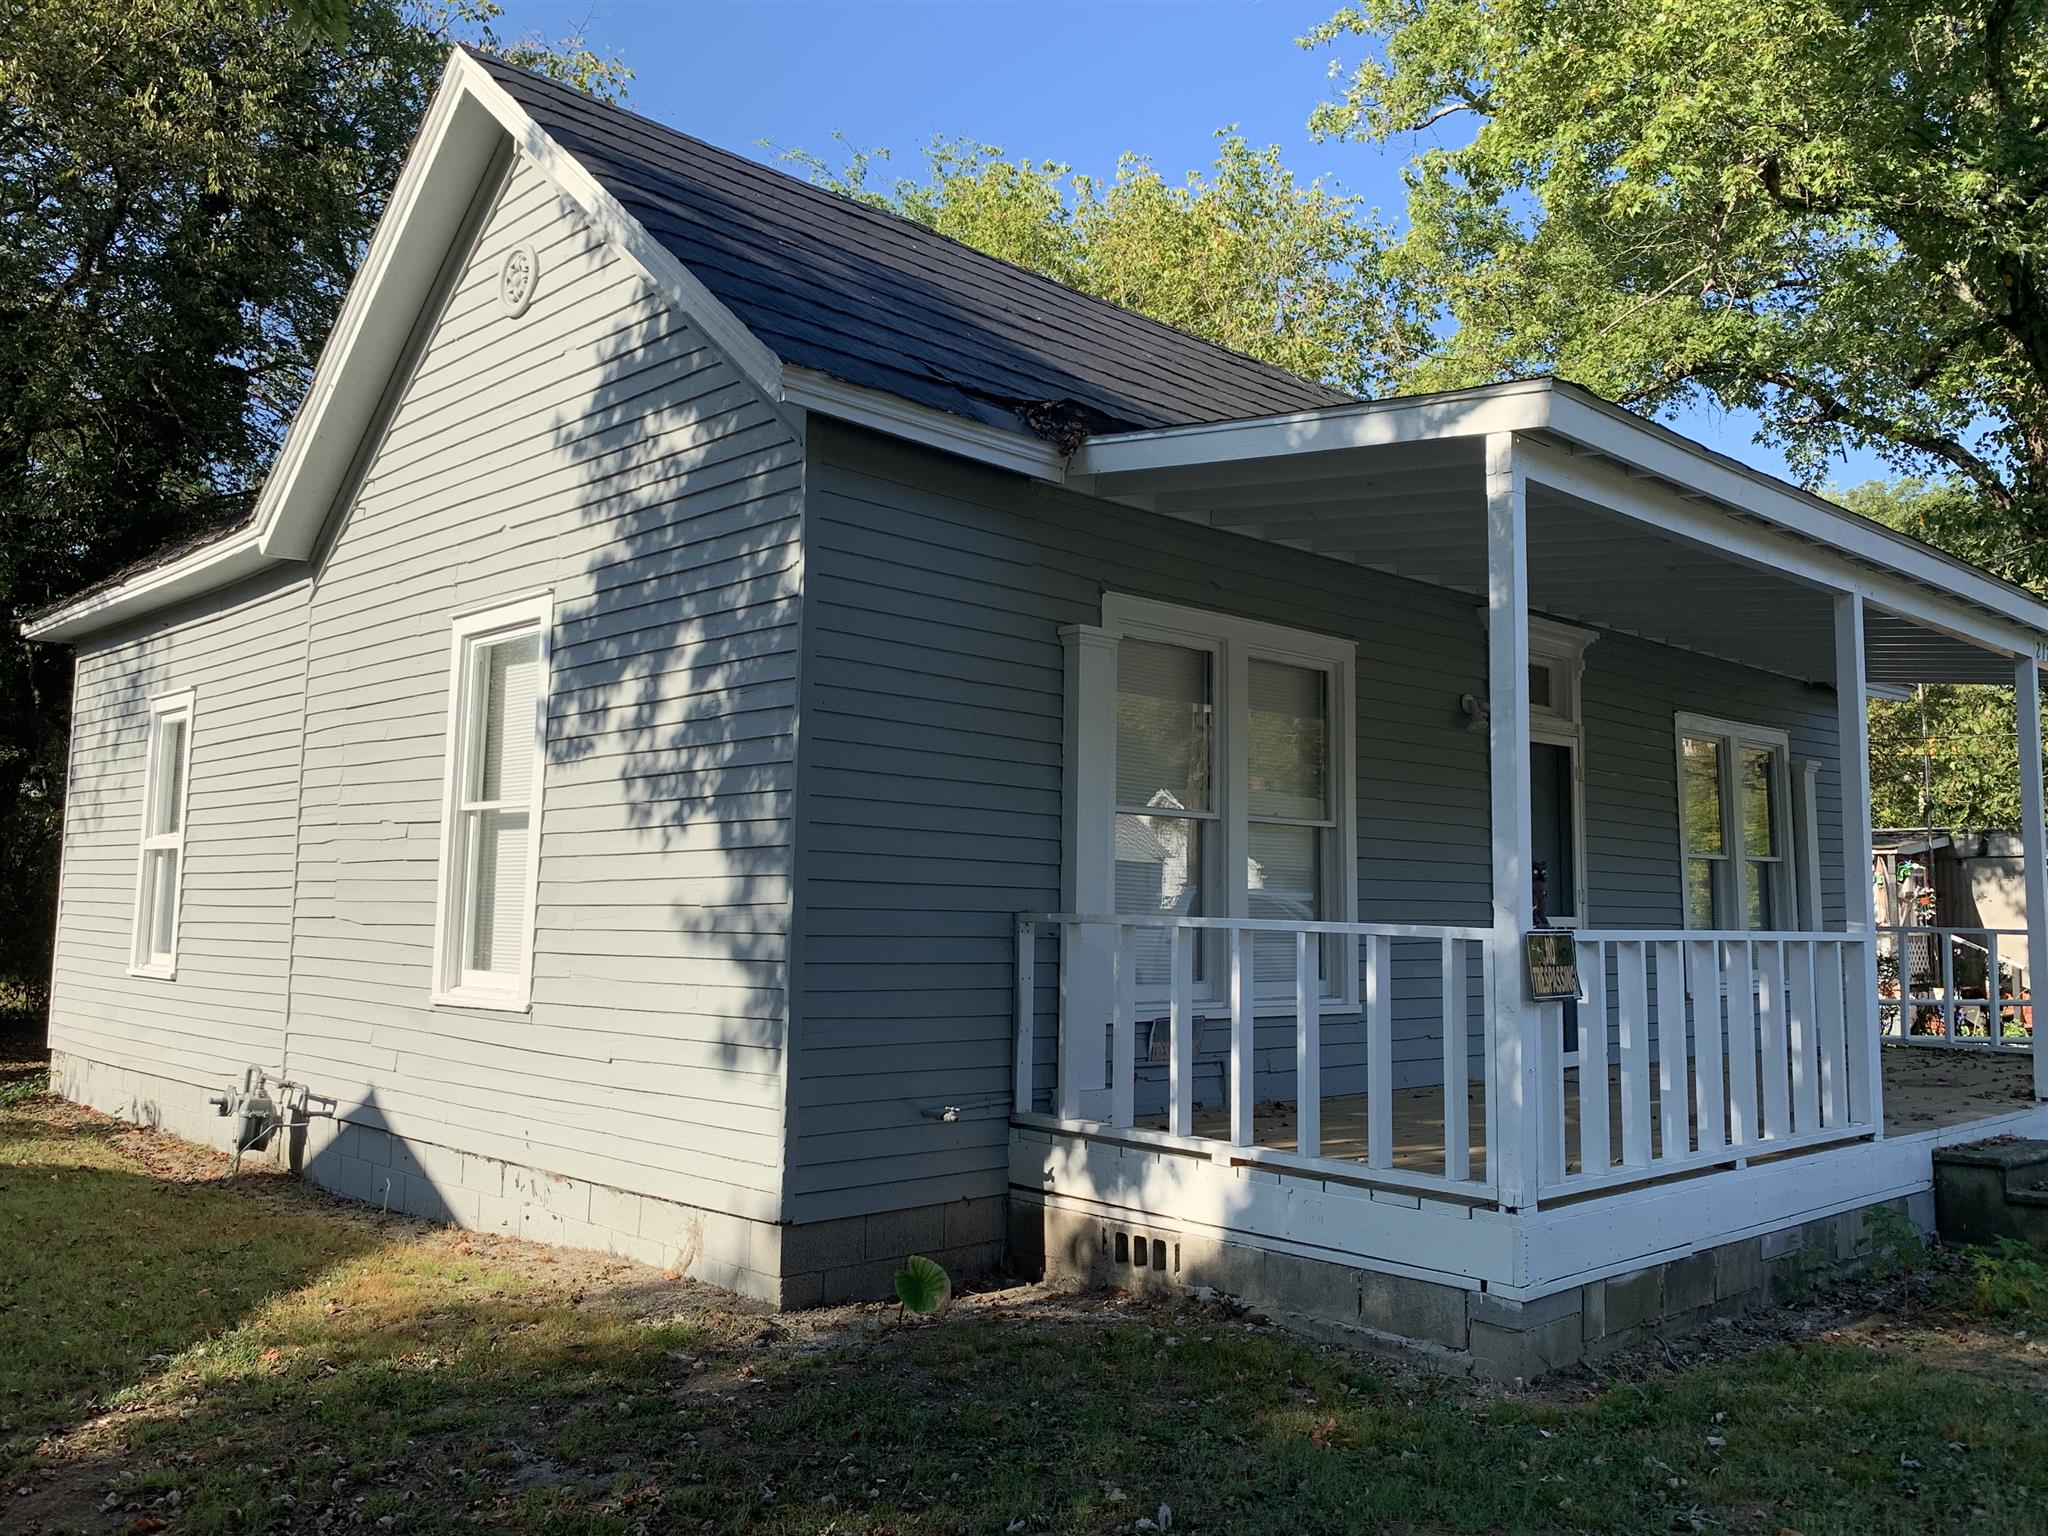 217 E Flower St, Pulaski, Tennessee 38478, 2 Bedrooms Bedrooms, ,1 BathroomBathrooms,Single Family,For Sale,217 E Flower St,1,2091839